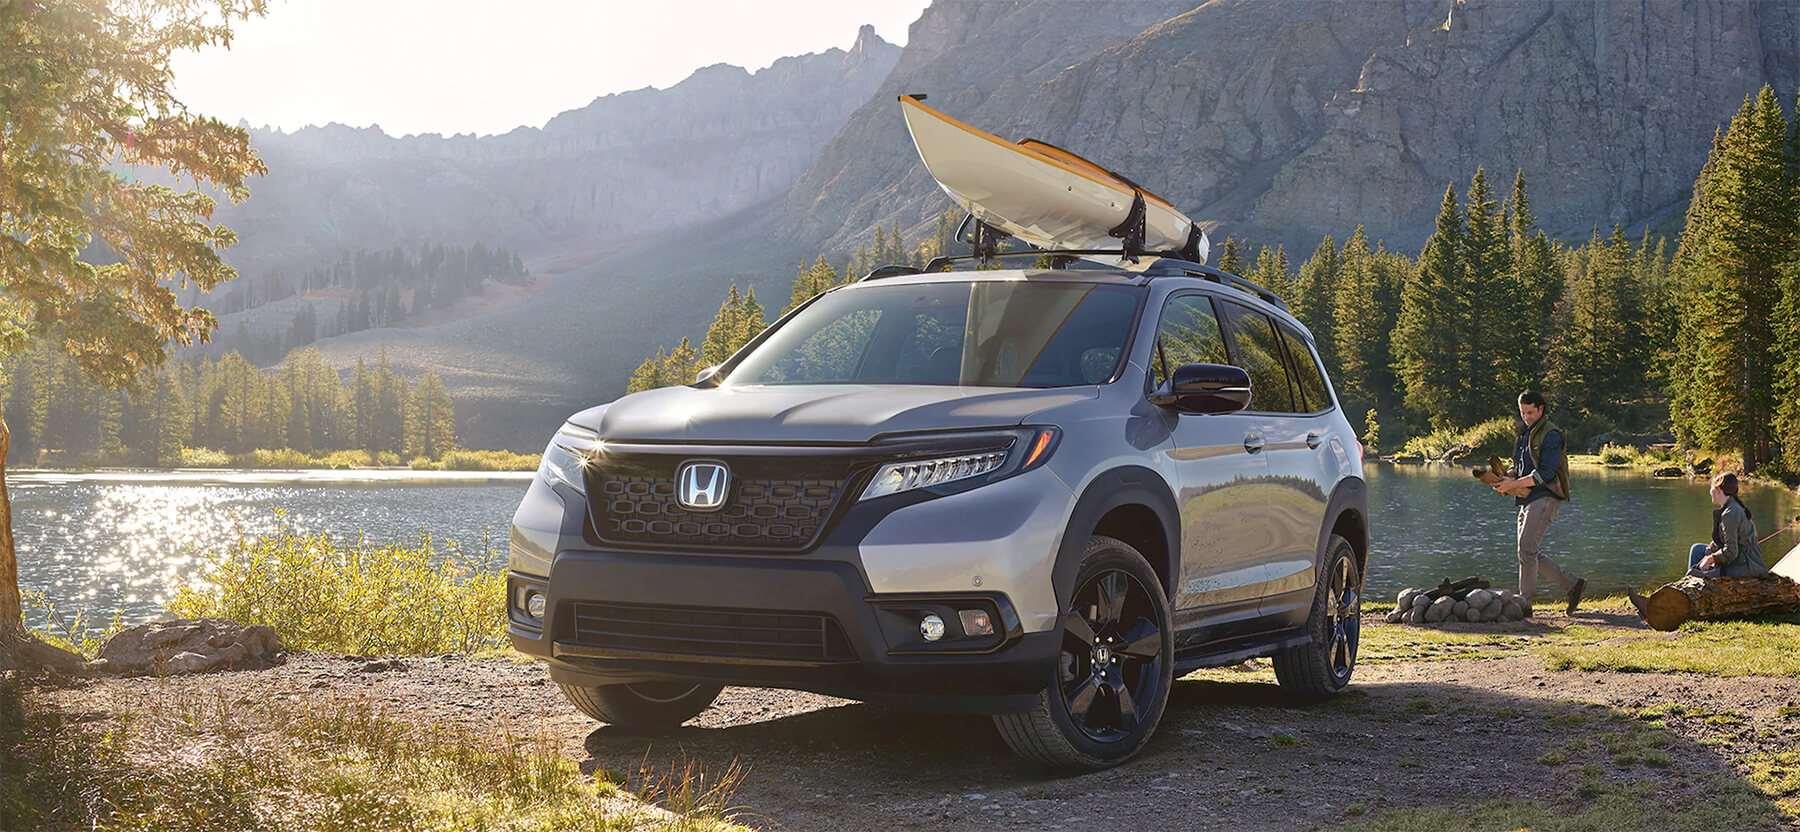 2021 Honda Passport Intro Vern Eide Honda Sioux City Slider